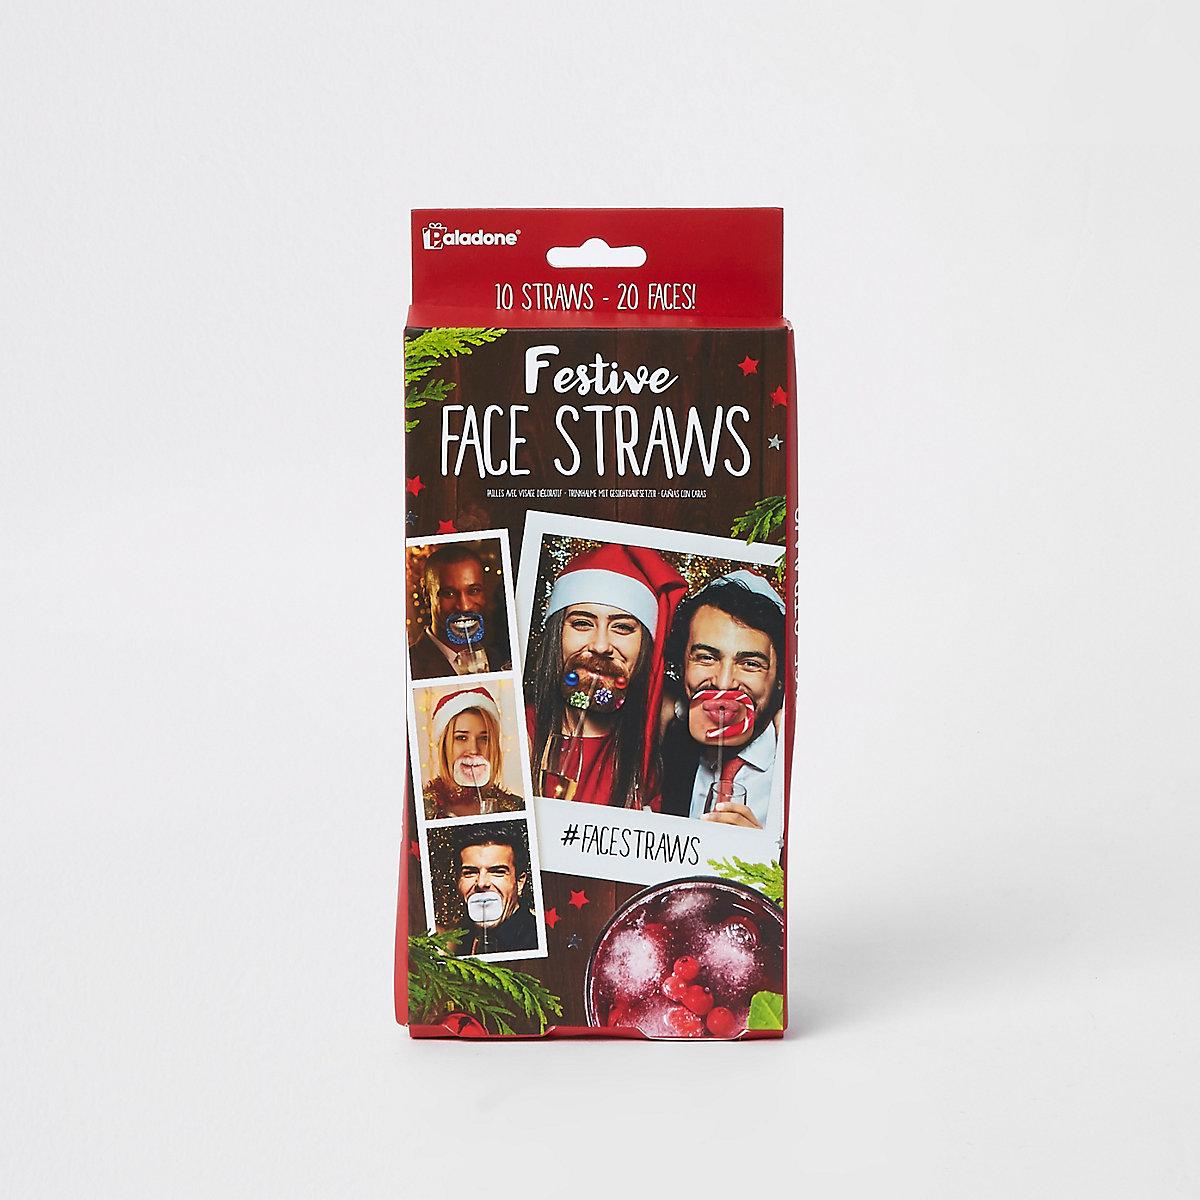 Christmas festive face straws